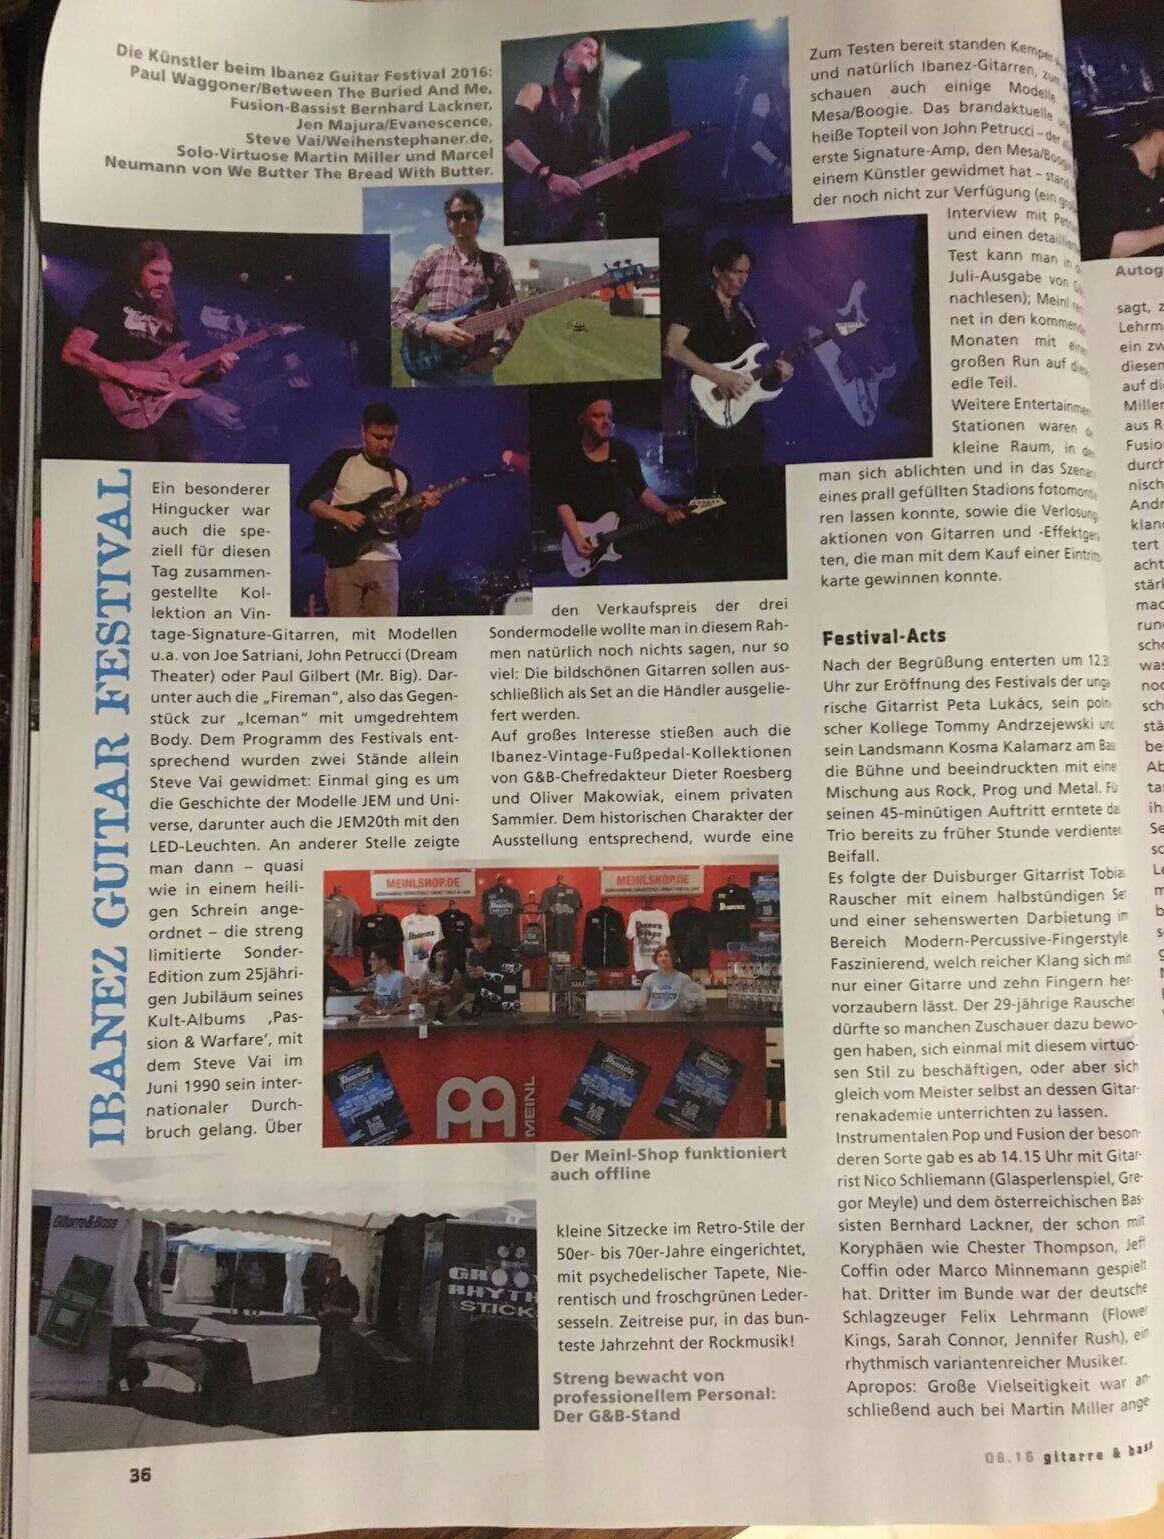 Ibanez Guitar Festival